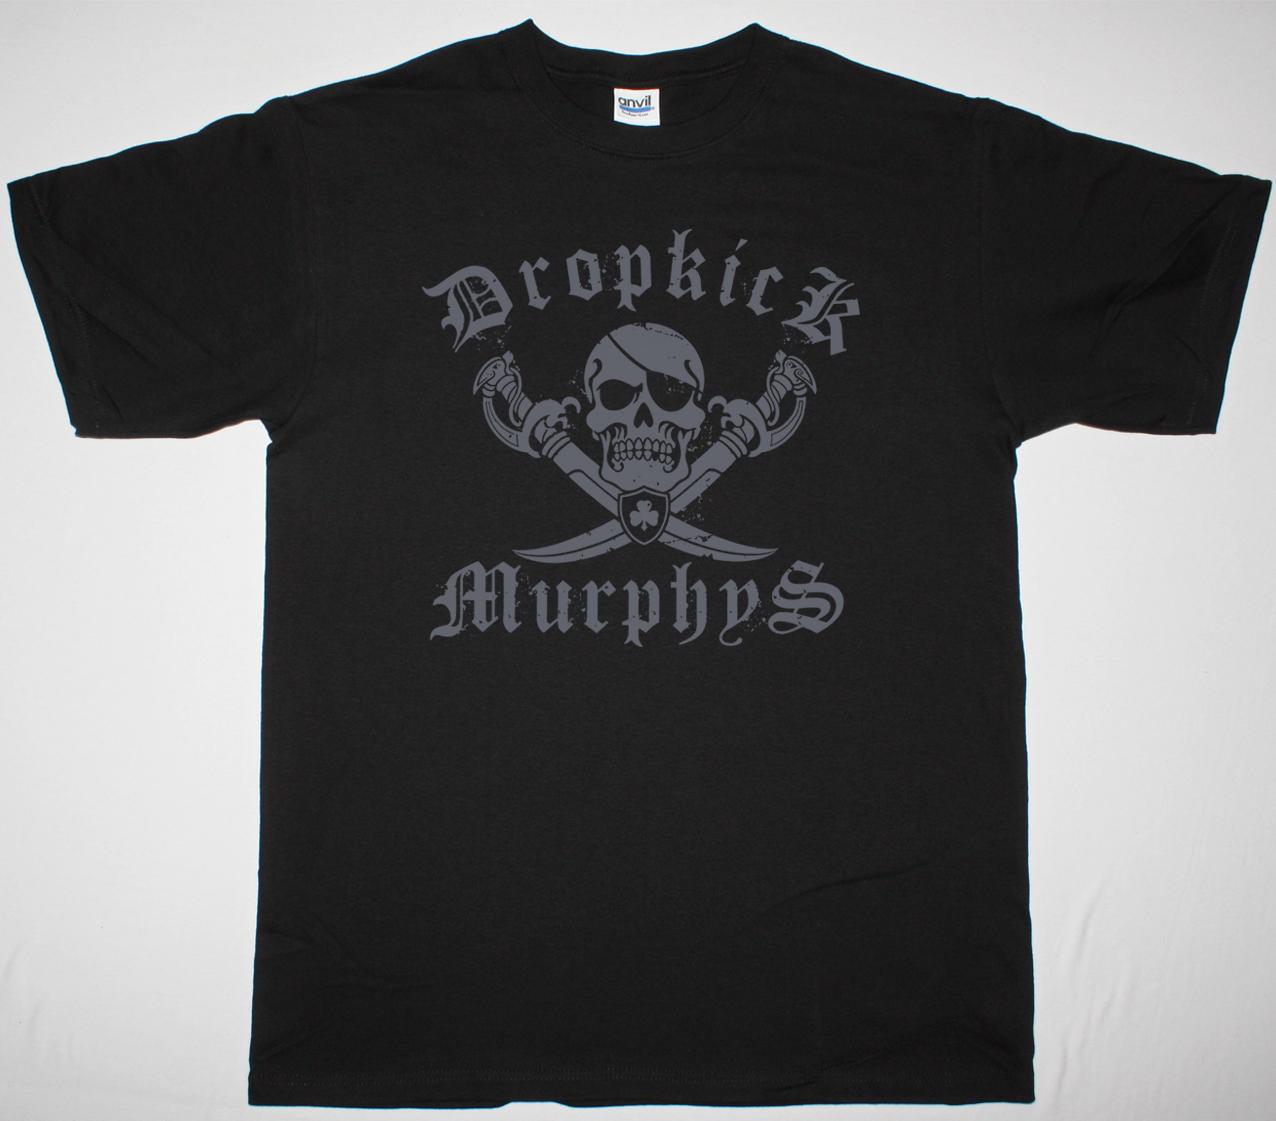 DROPKICK MURPHYS JOLLY ROGER NEW BLACK T-SHIRT